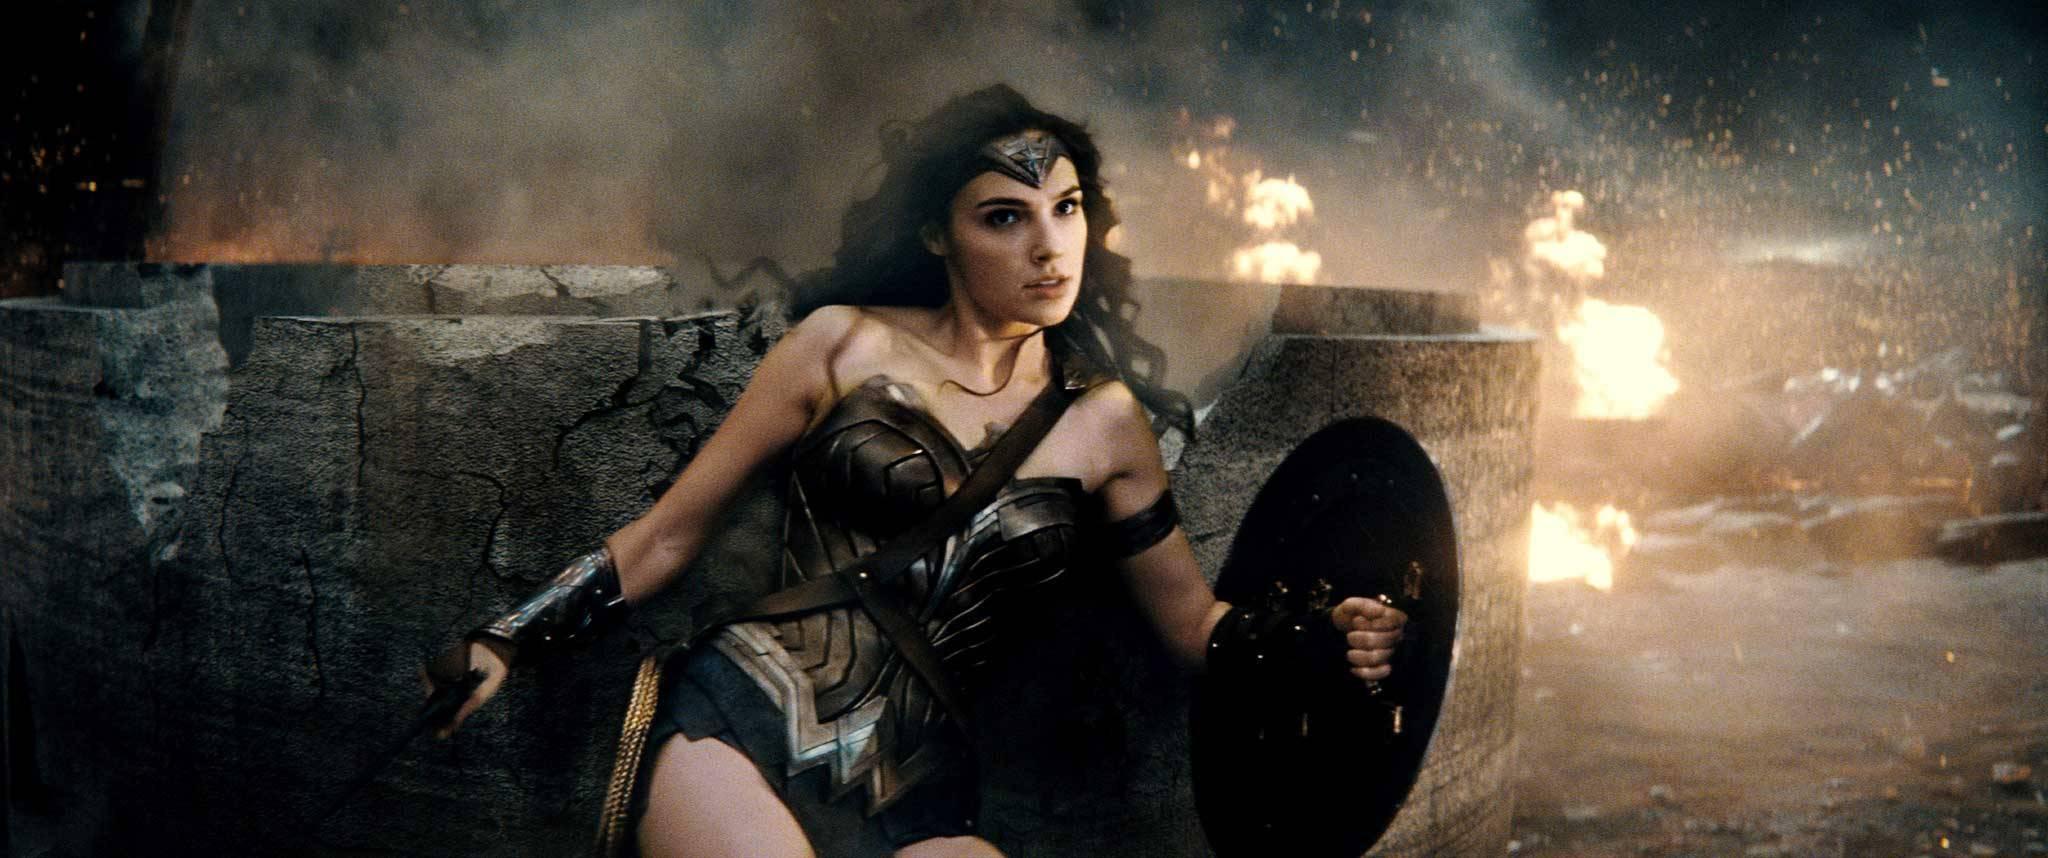 wonder woman gal gadot batman v superman warner bros dc comics superheros